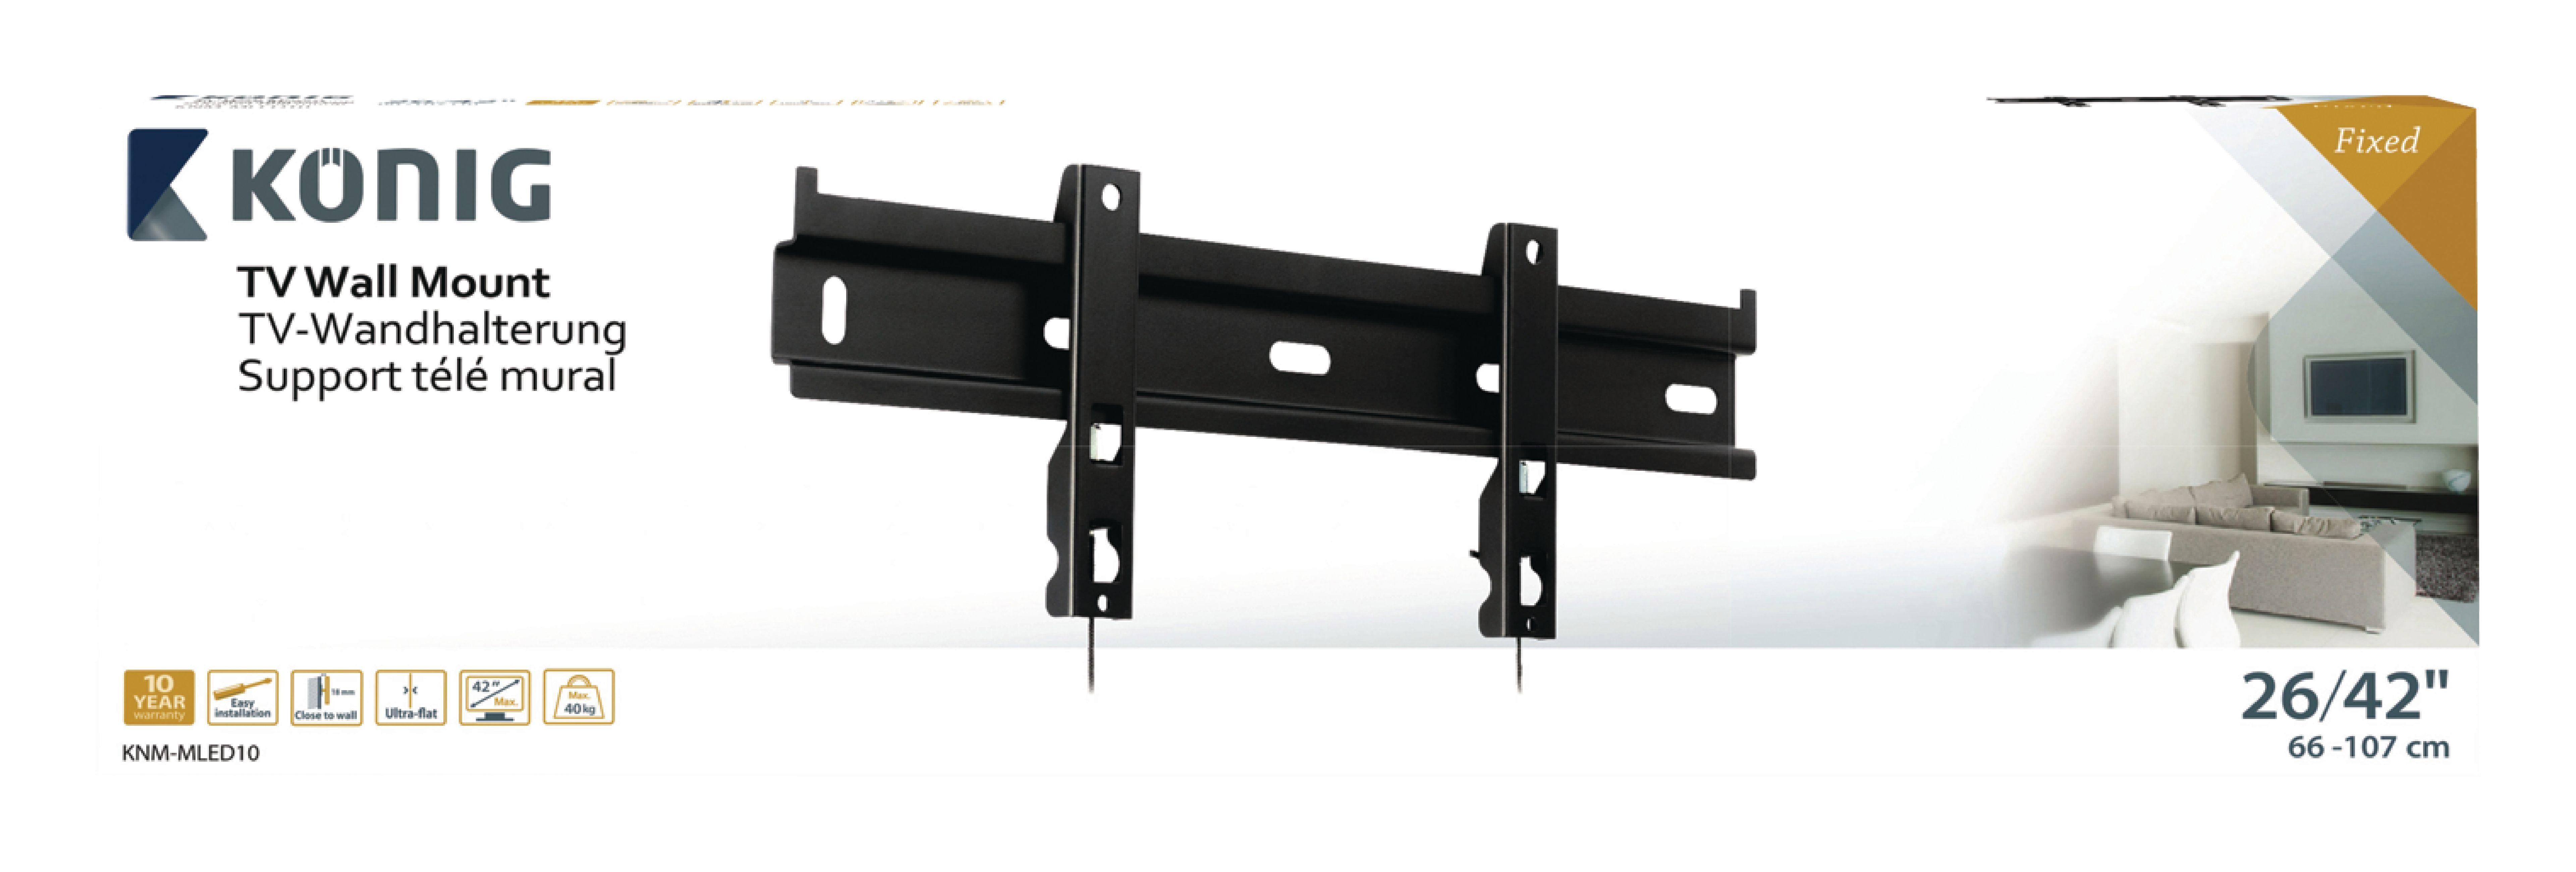 KNM-MLED10 - König - TV Wall Mount Fixed 26 - 42